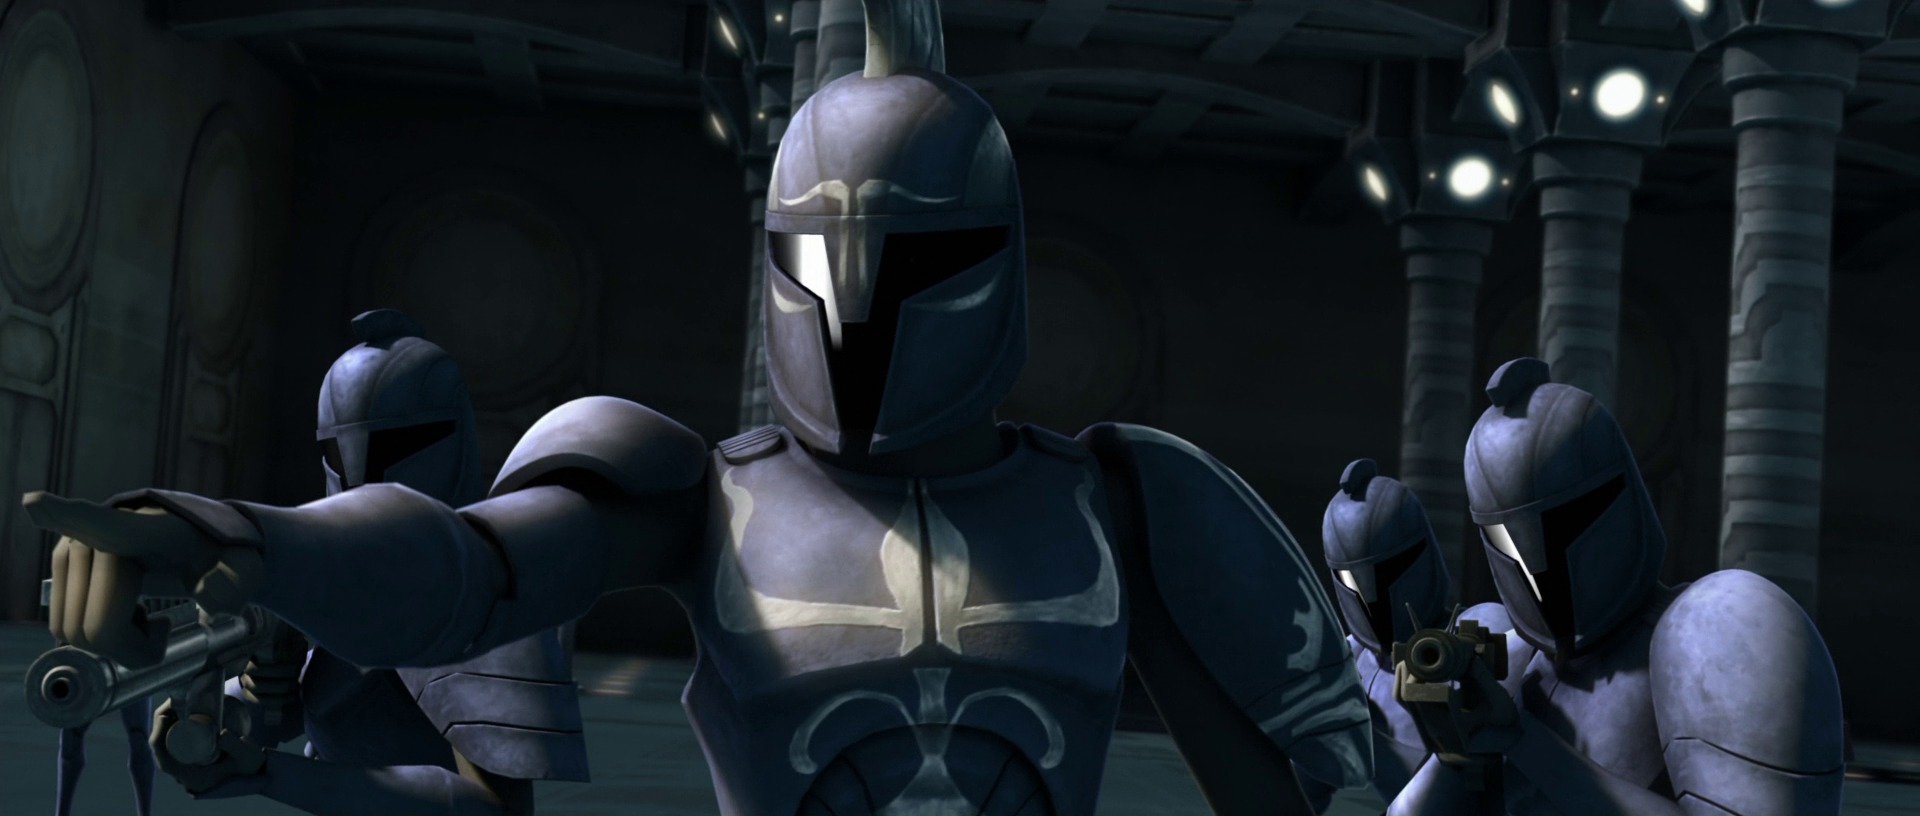 Senate Guard Commandos